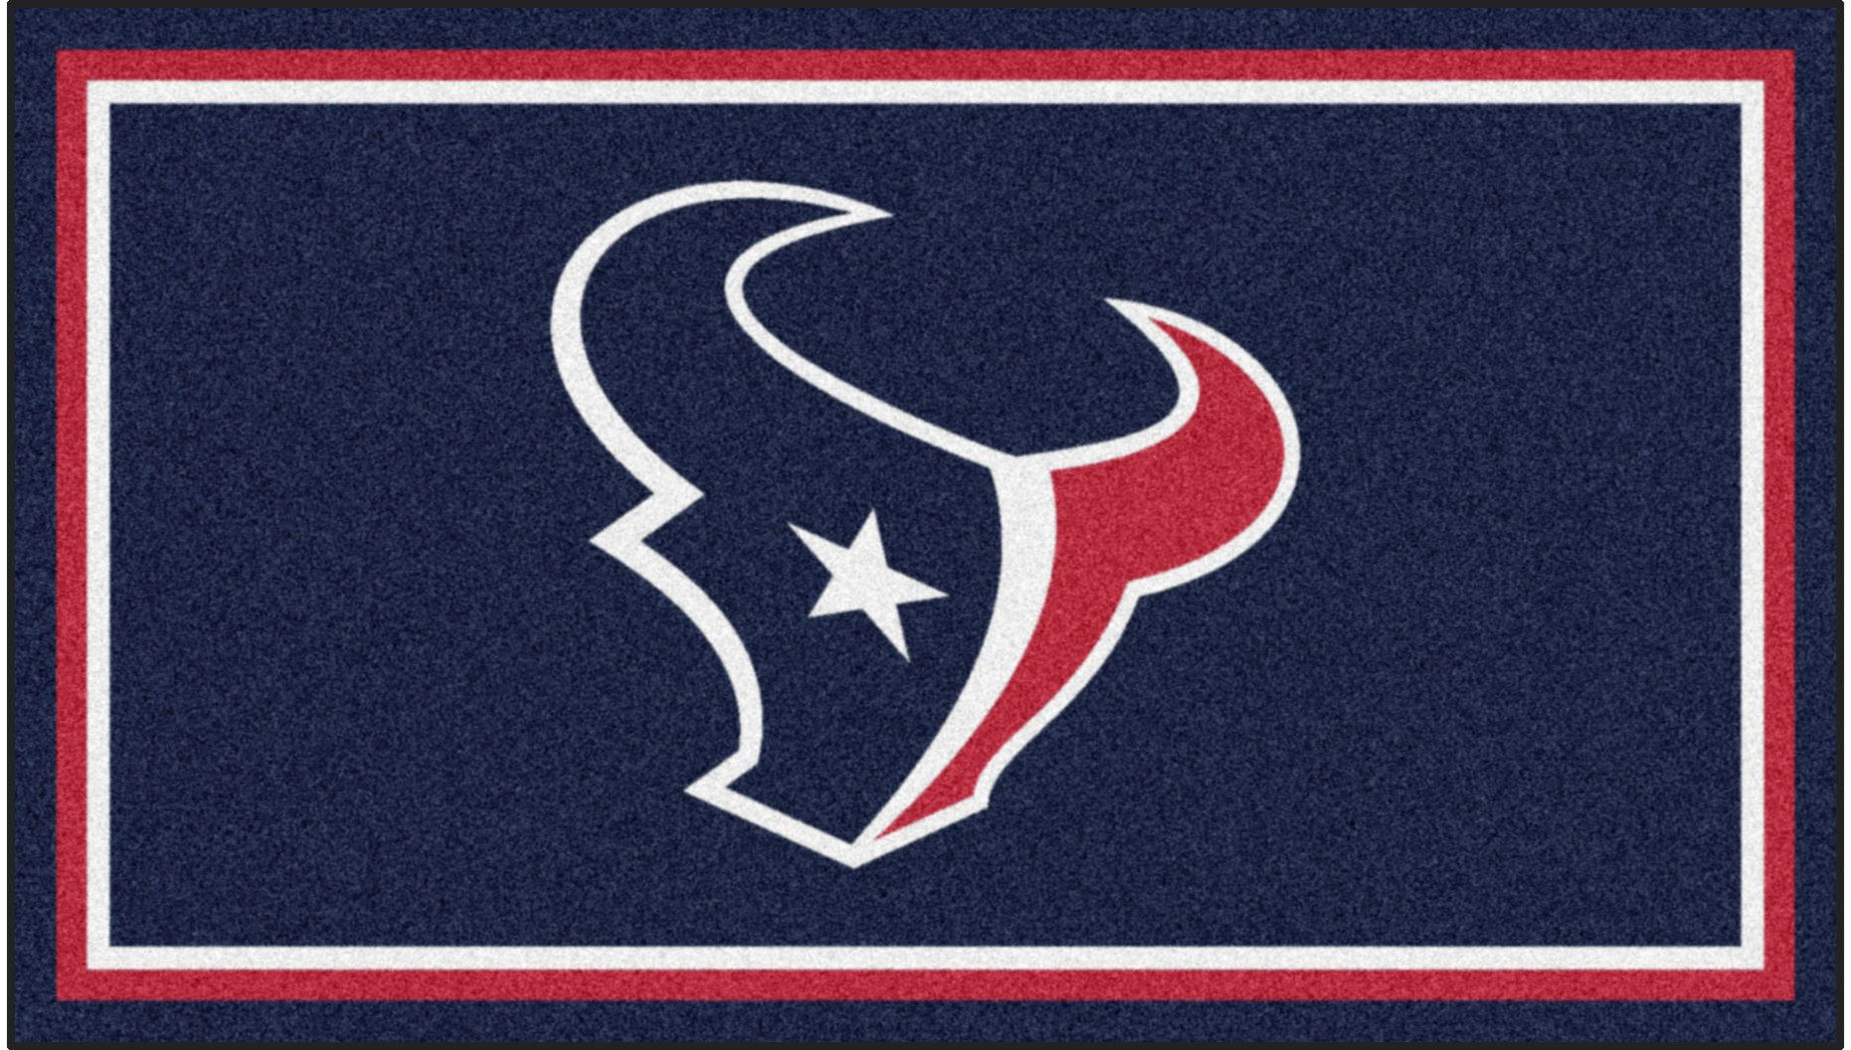 NFL Big Game Houston Texans 3' x 5' Rug